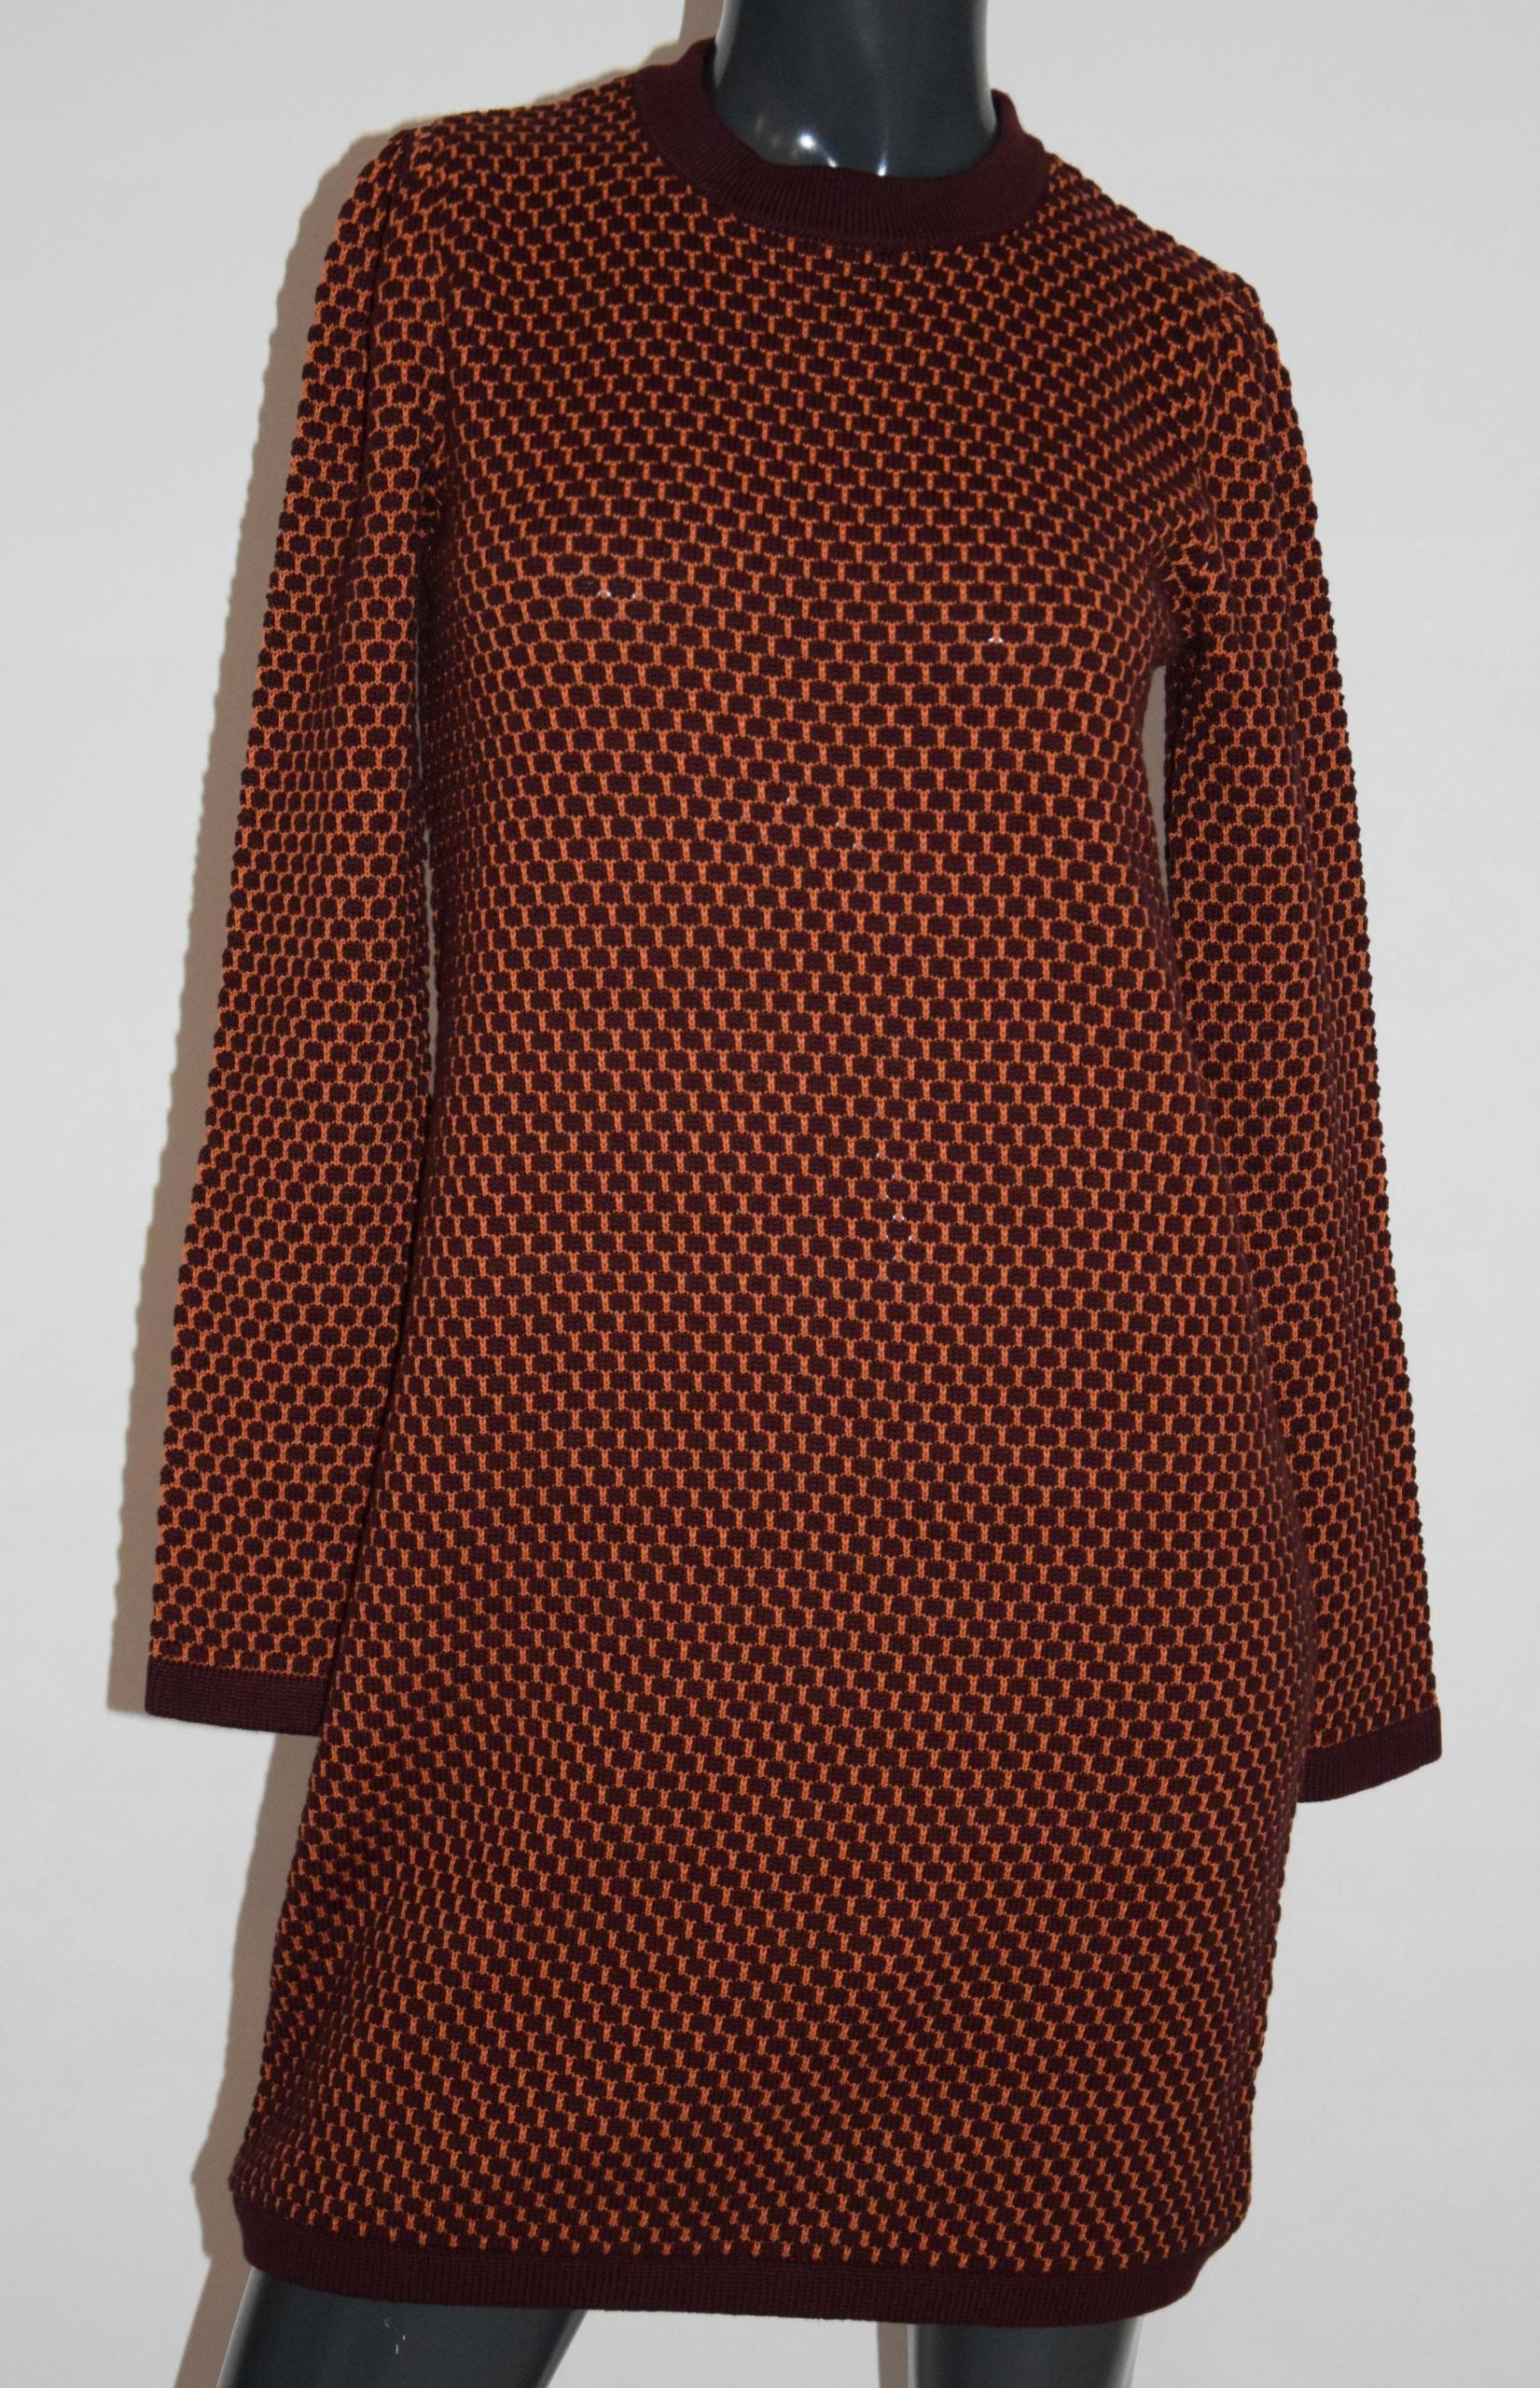 cos bordowa sukienka dzianina bawełna bufki XS/S